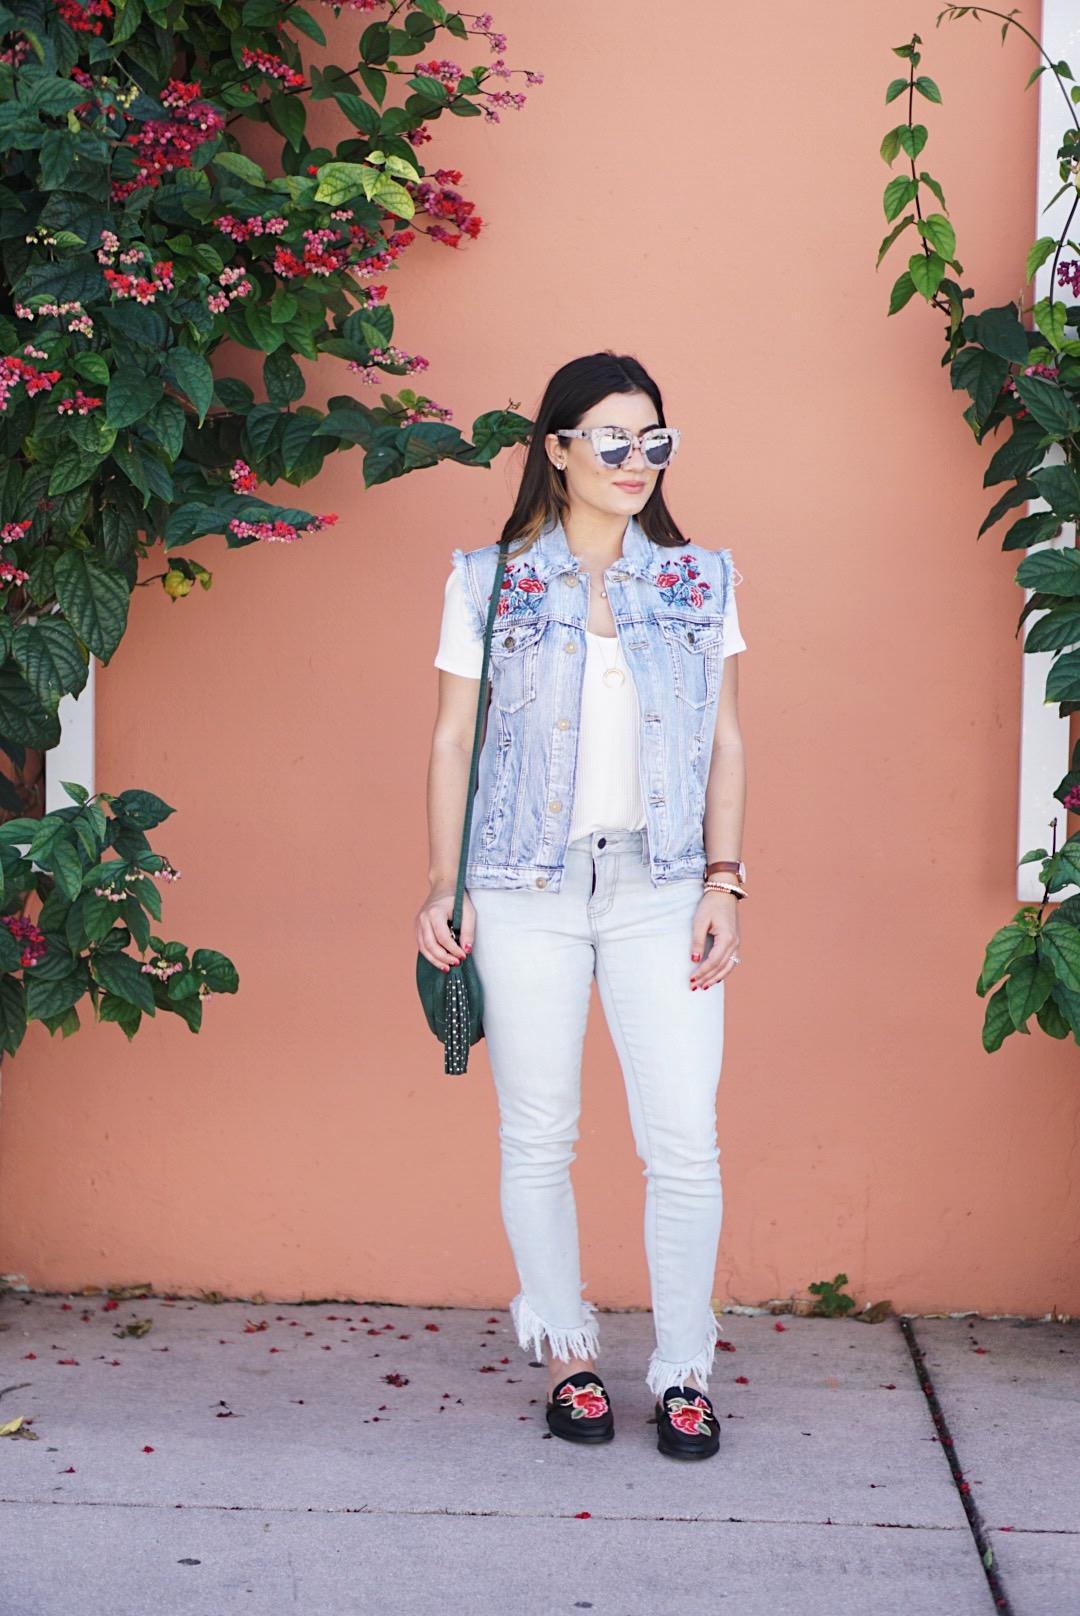 Blogger Krista Perez from Sugar Love Chic styles forever21 denim vest for Spring